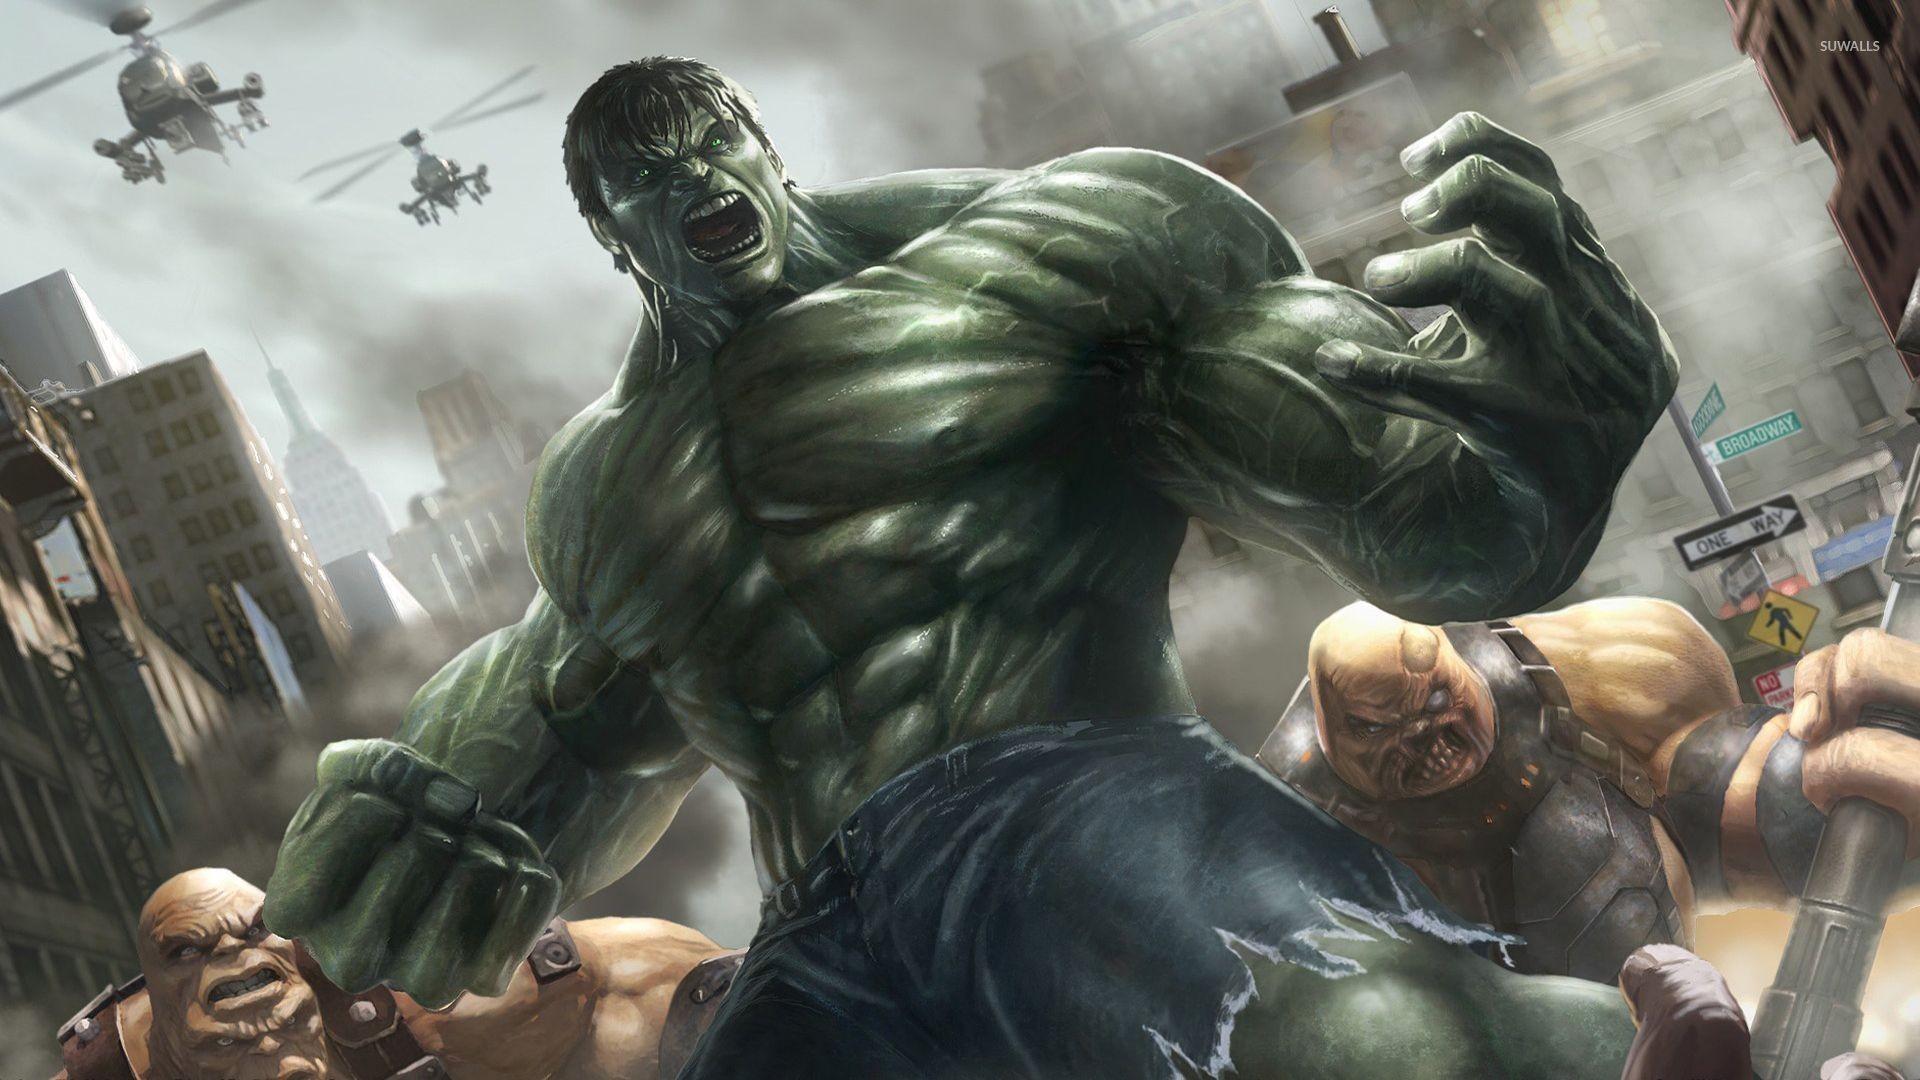 Hulk 2 Wallpapers Wallpapertag